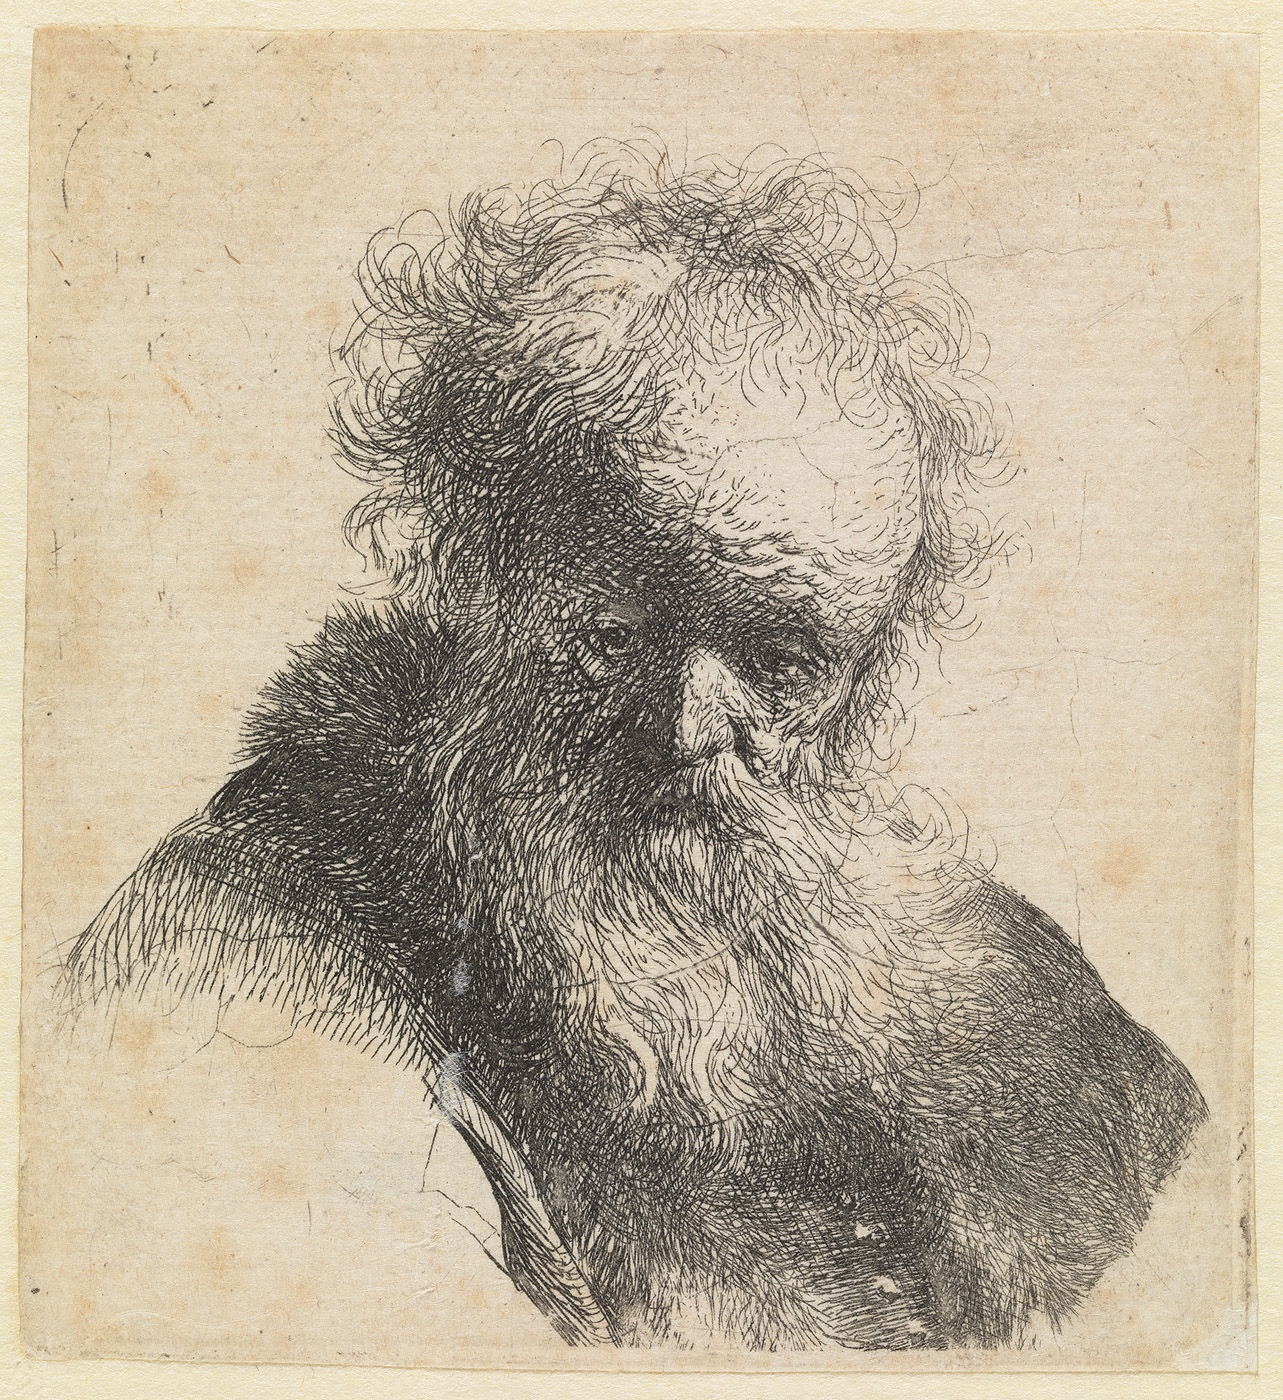 Oude man met lange baard en witte hemdsmouw: buste